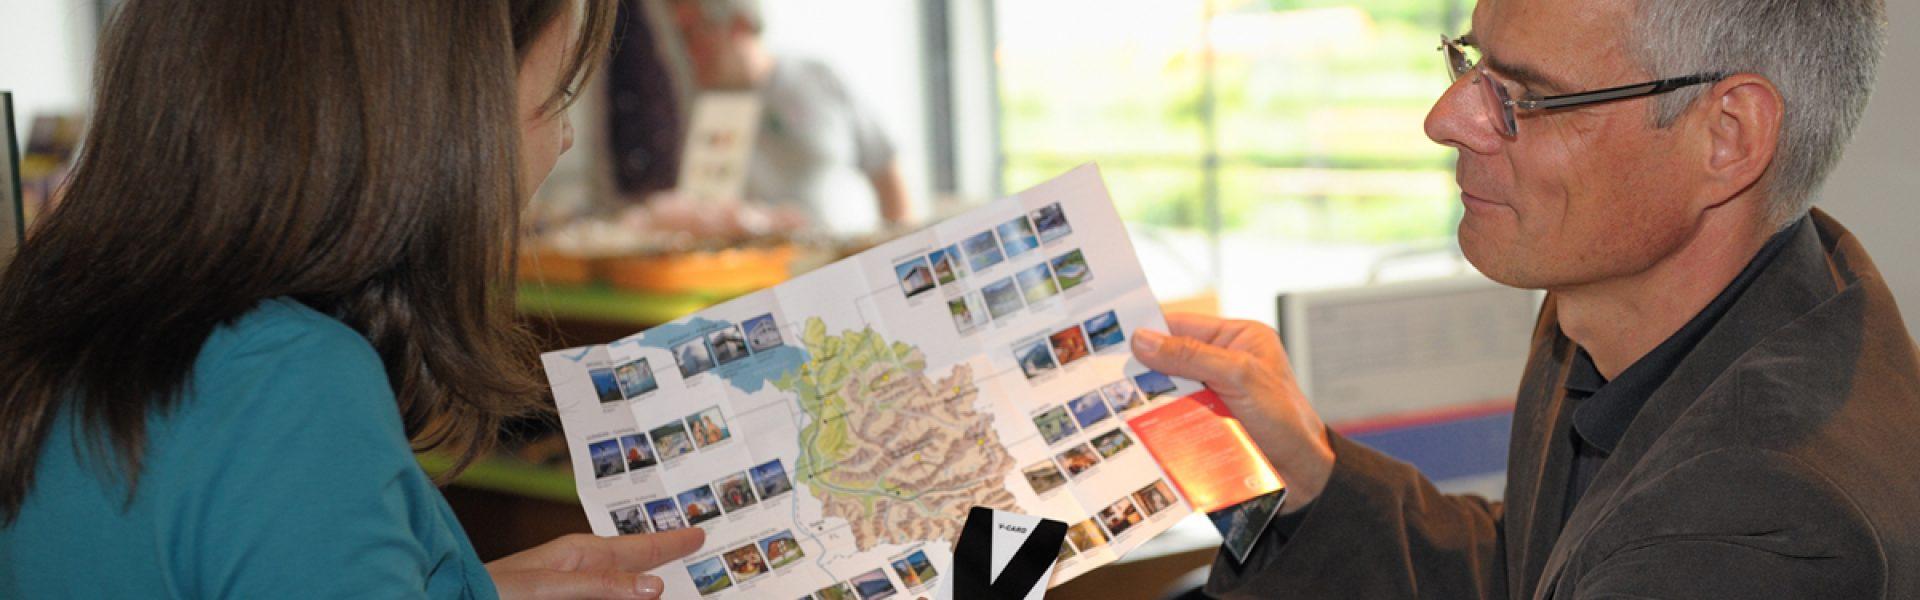 Vorarlberg Tourismus, V-CARD, Broschüre (c) Stiplovsek Dietmar